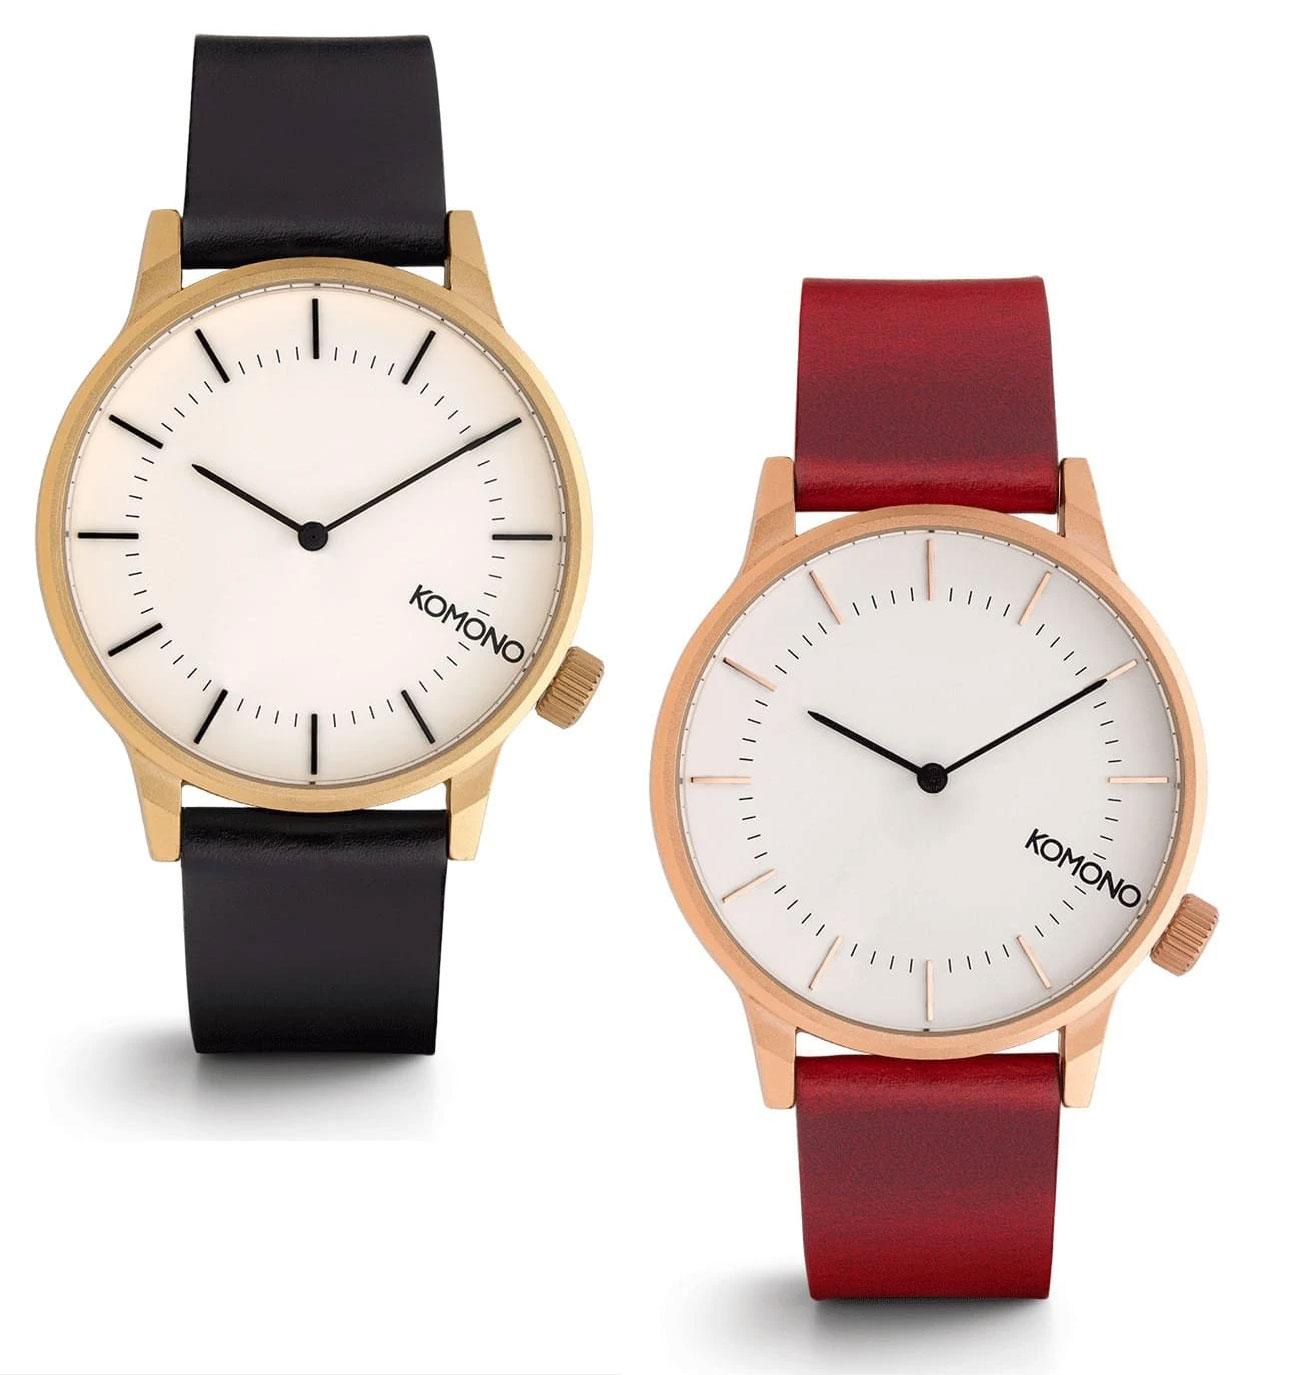 Komono Winston Regal unisex horloge [2 kleuren] @ A.S.Adventure